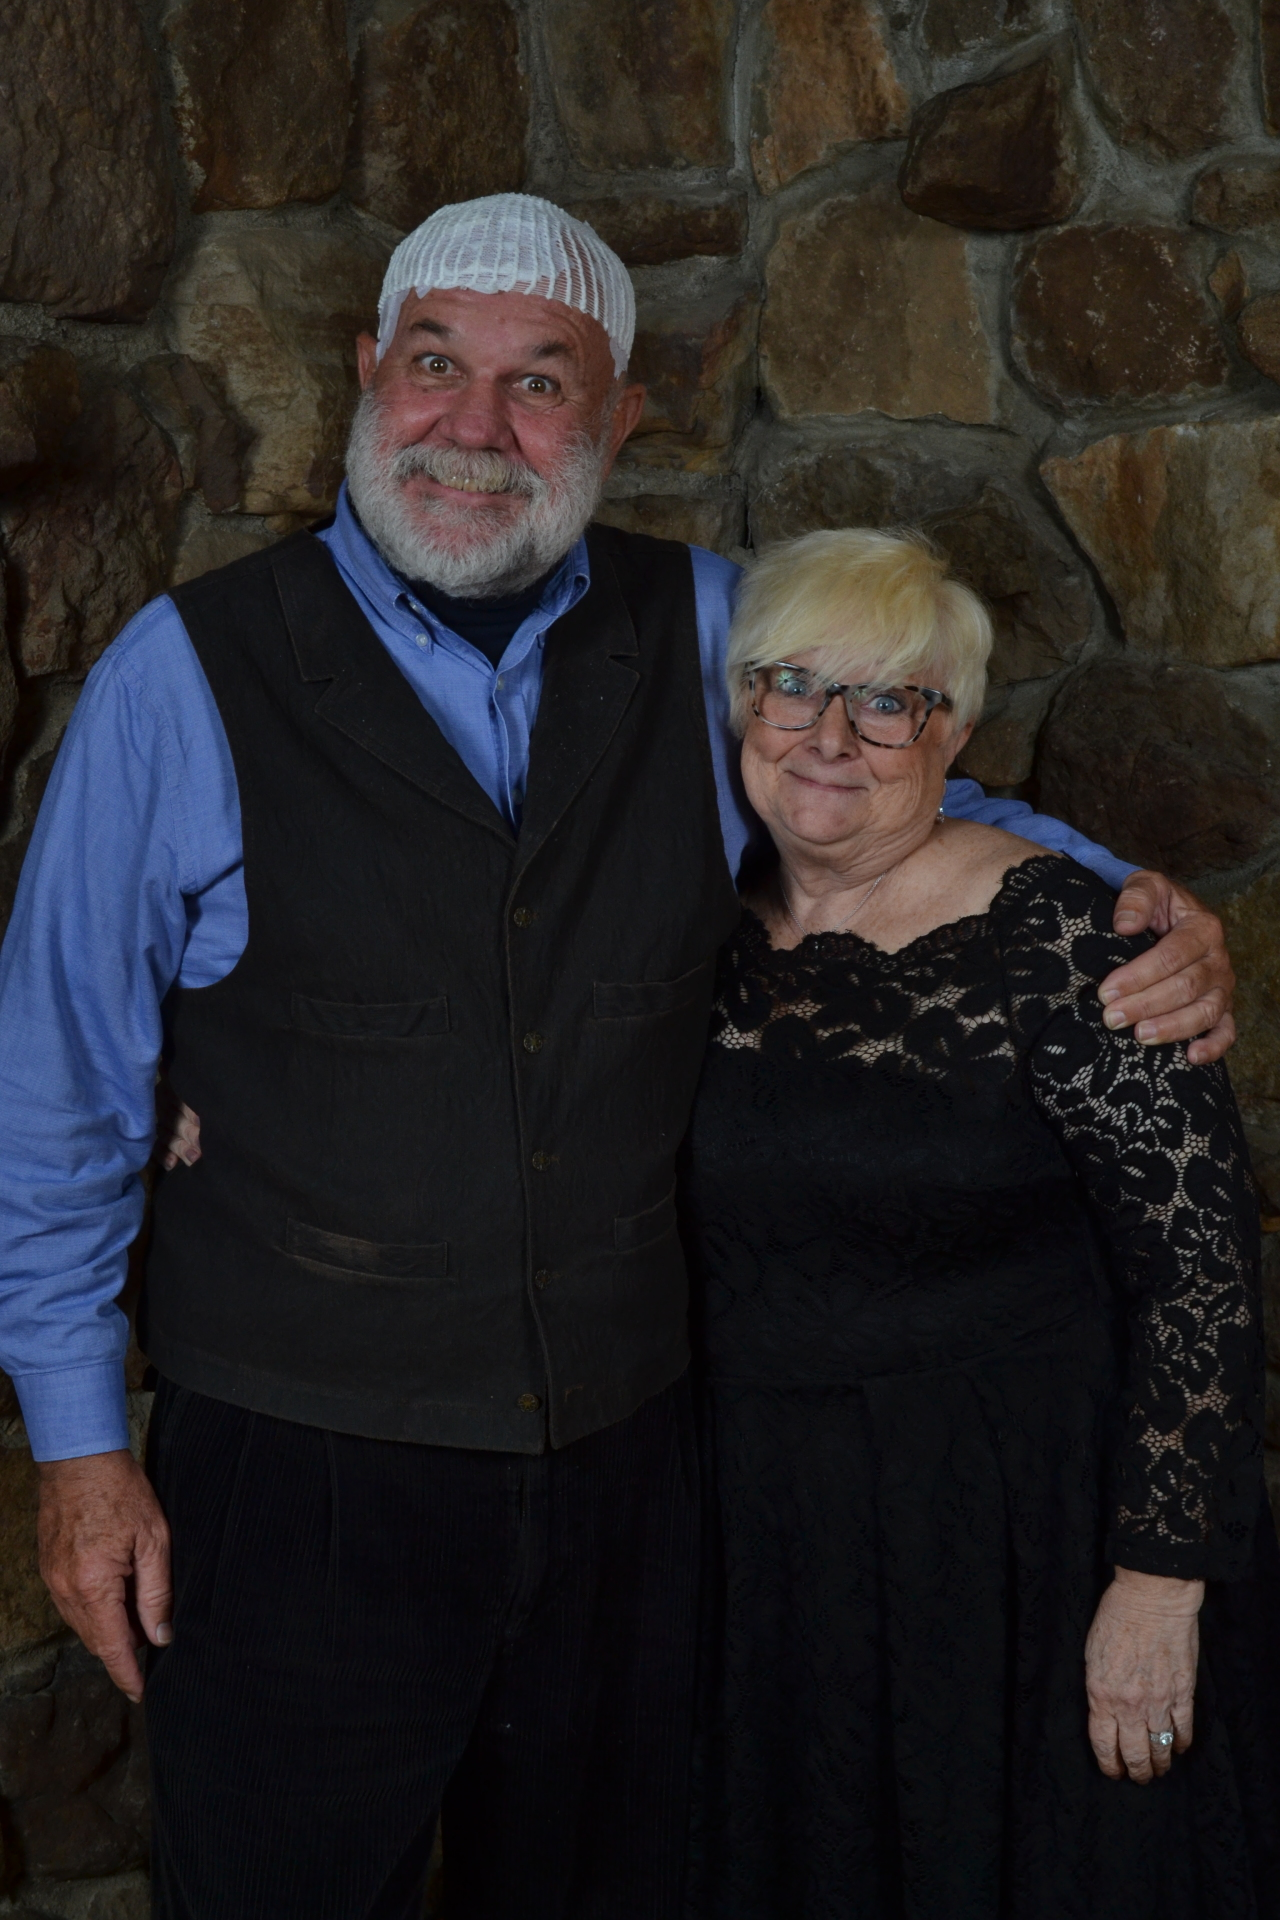 John and Judith